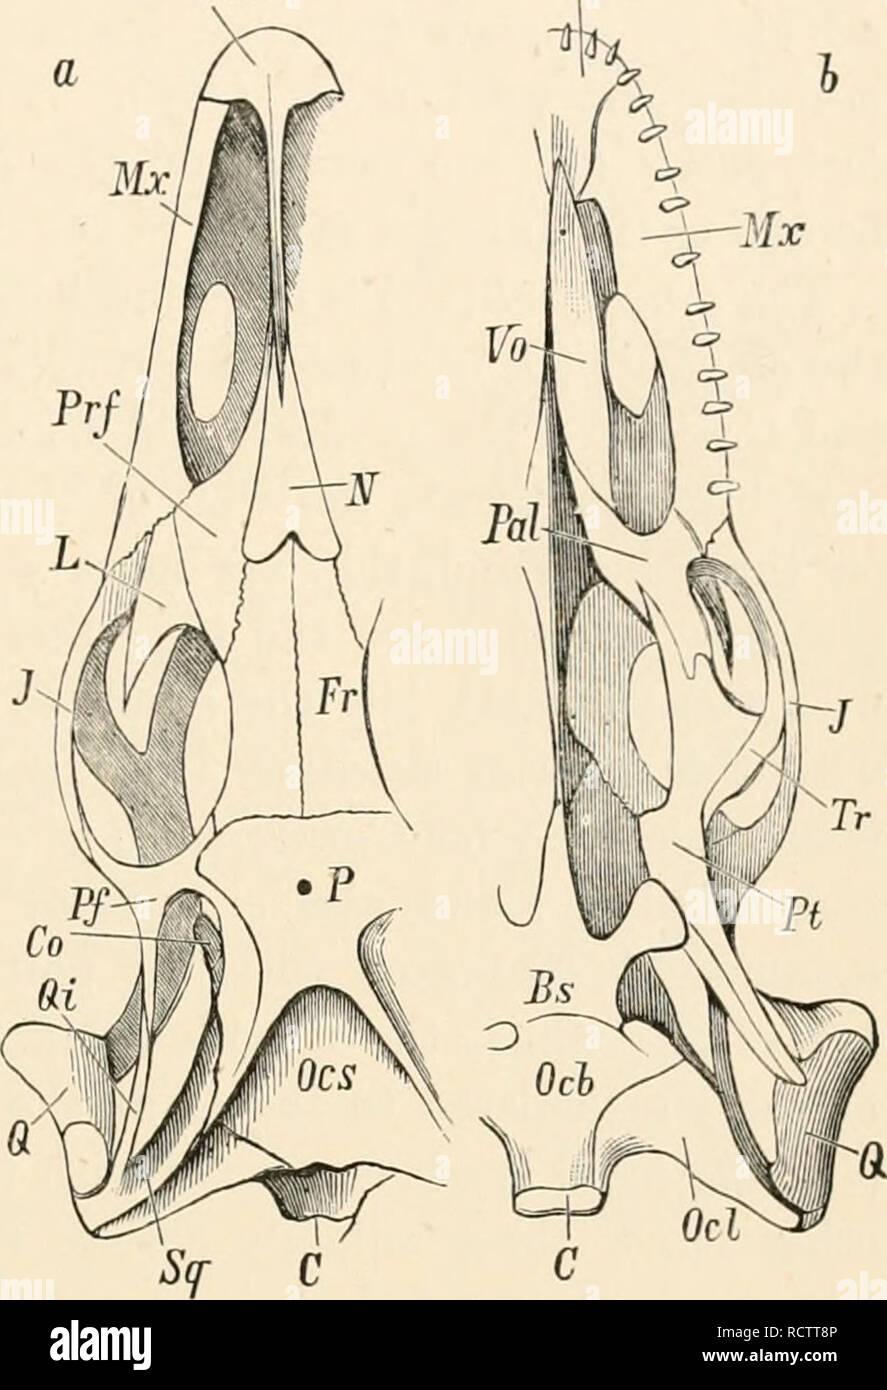 Skuli Stock Photos Images Alamy Snake Skeleton Diagram Elementary Text Book Of Zoology T1ik Vertebrre